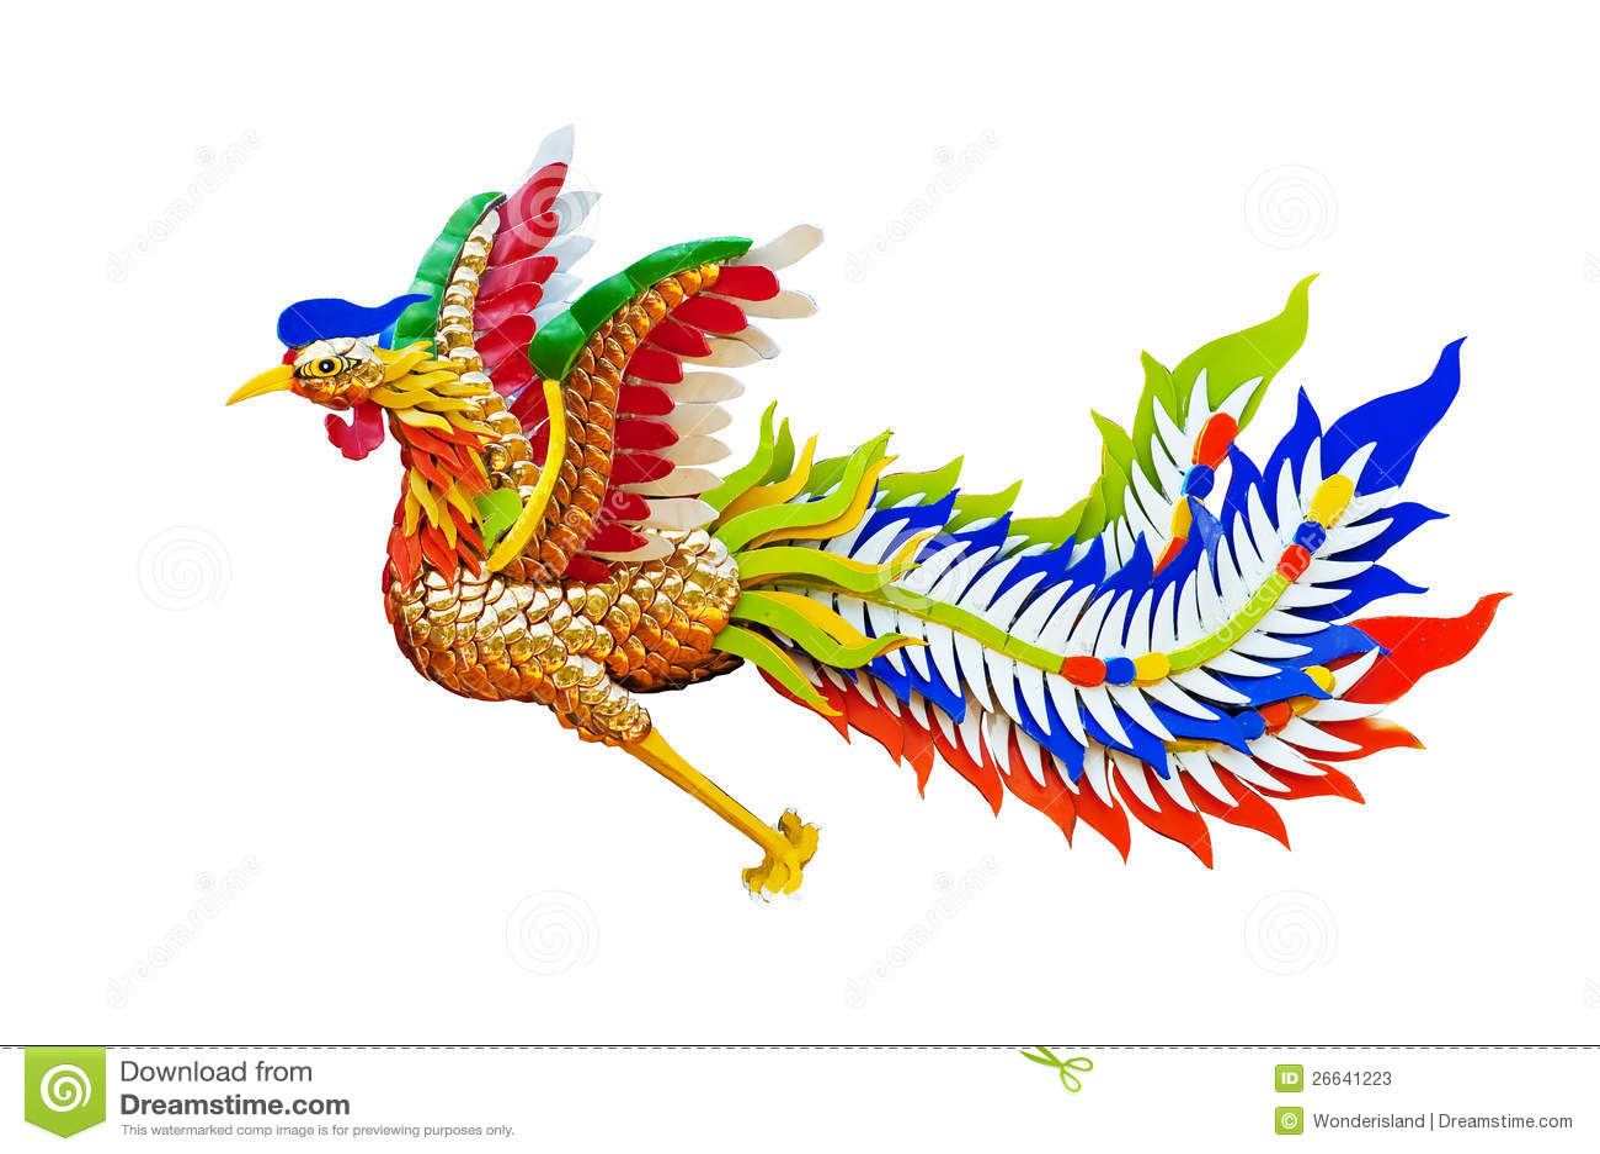 Feng huang chinese phoenix stock image image of phoenix 26641223 feng huang chinese phoenix biocorpaavc Gallery